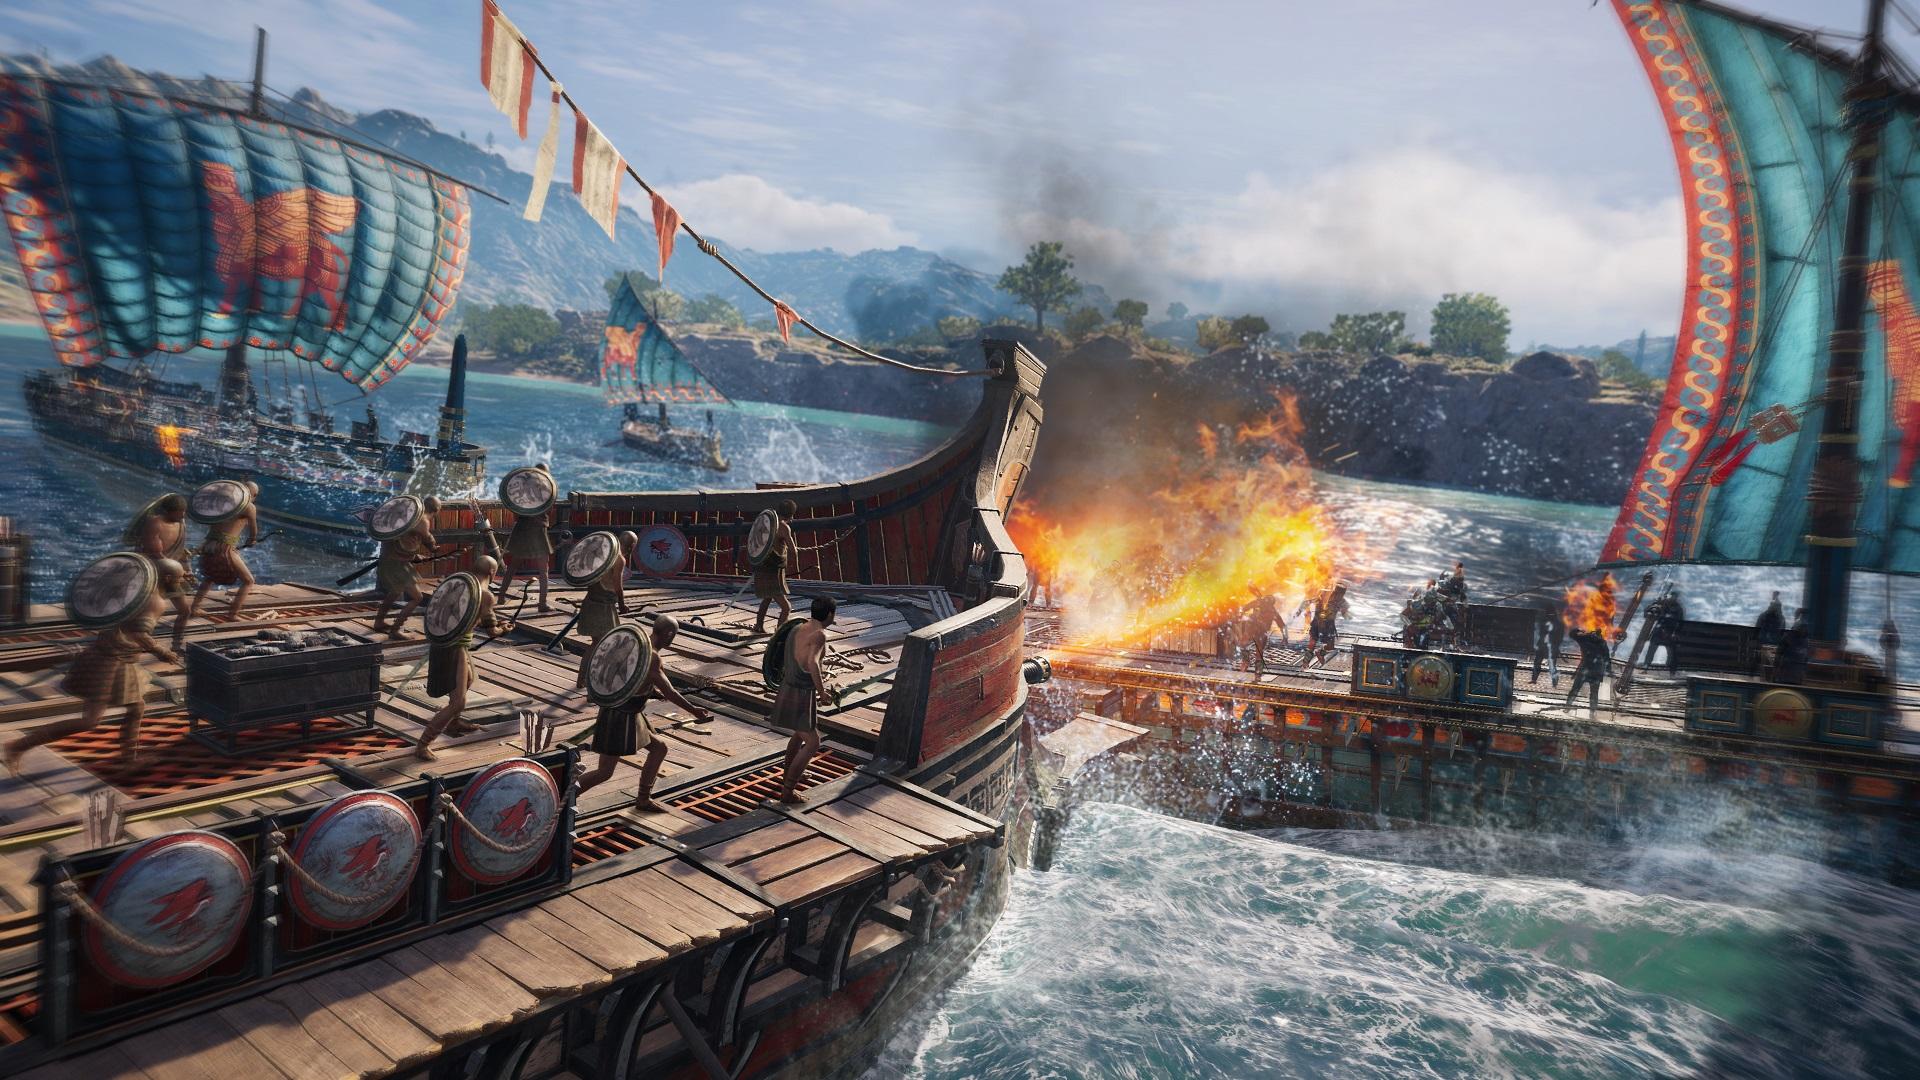 assassins-creed-odyssey-shadow-heritage-ship.jpg